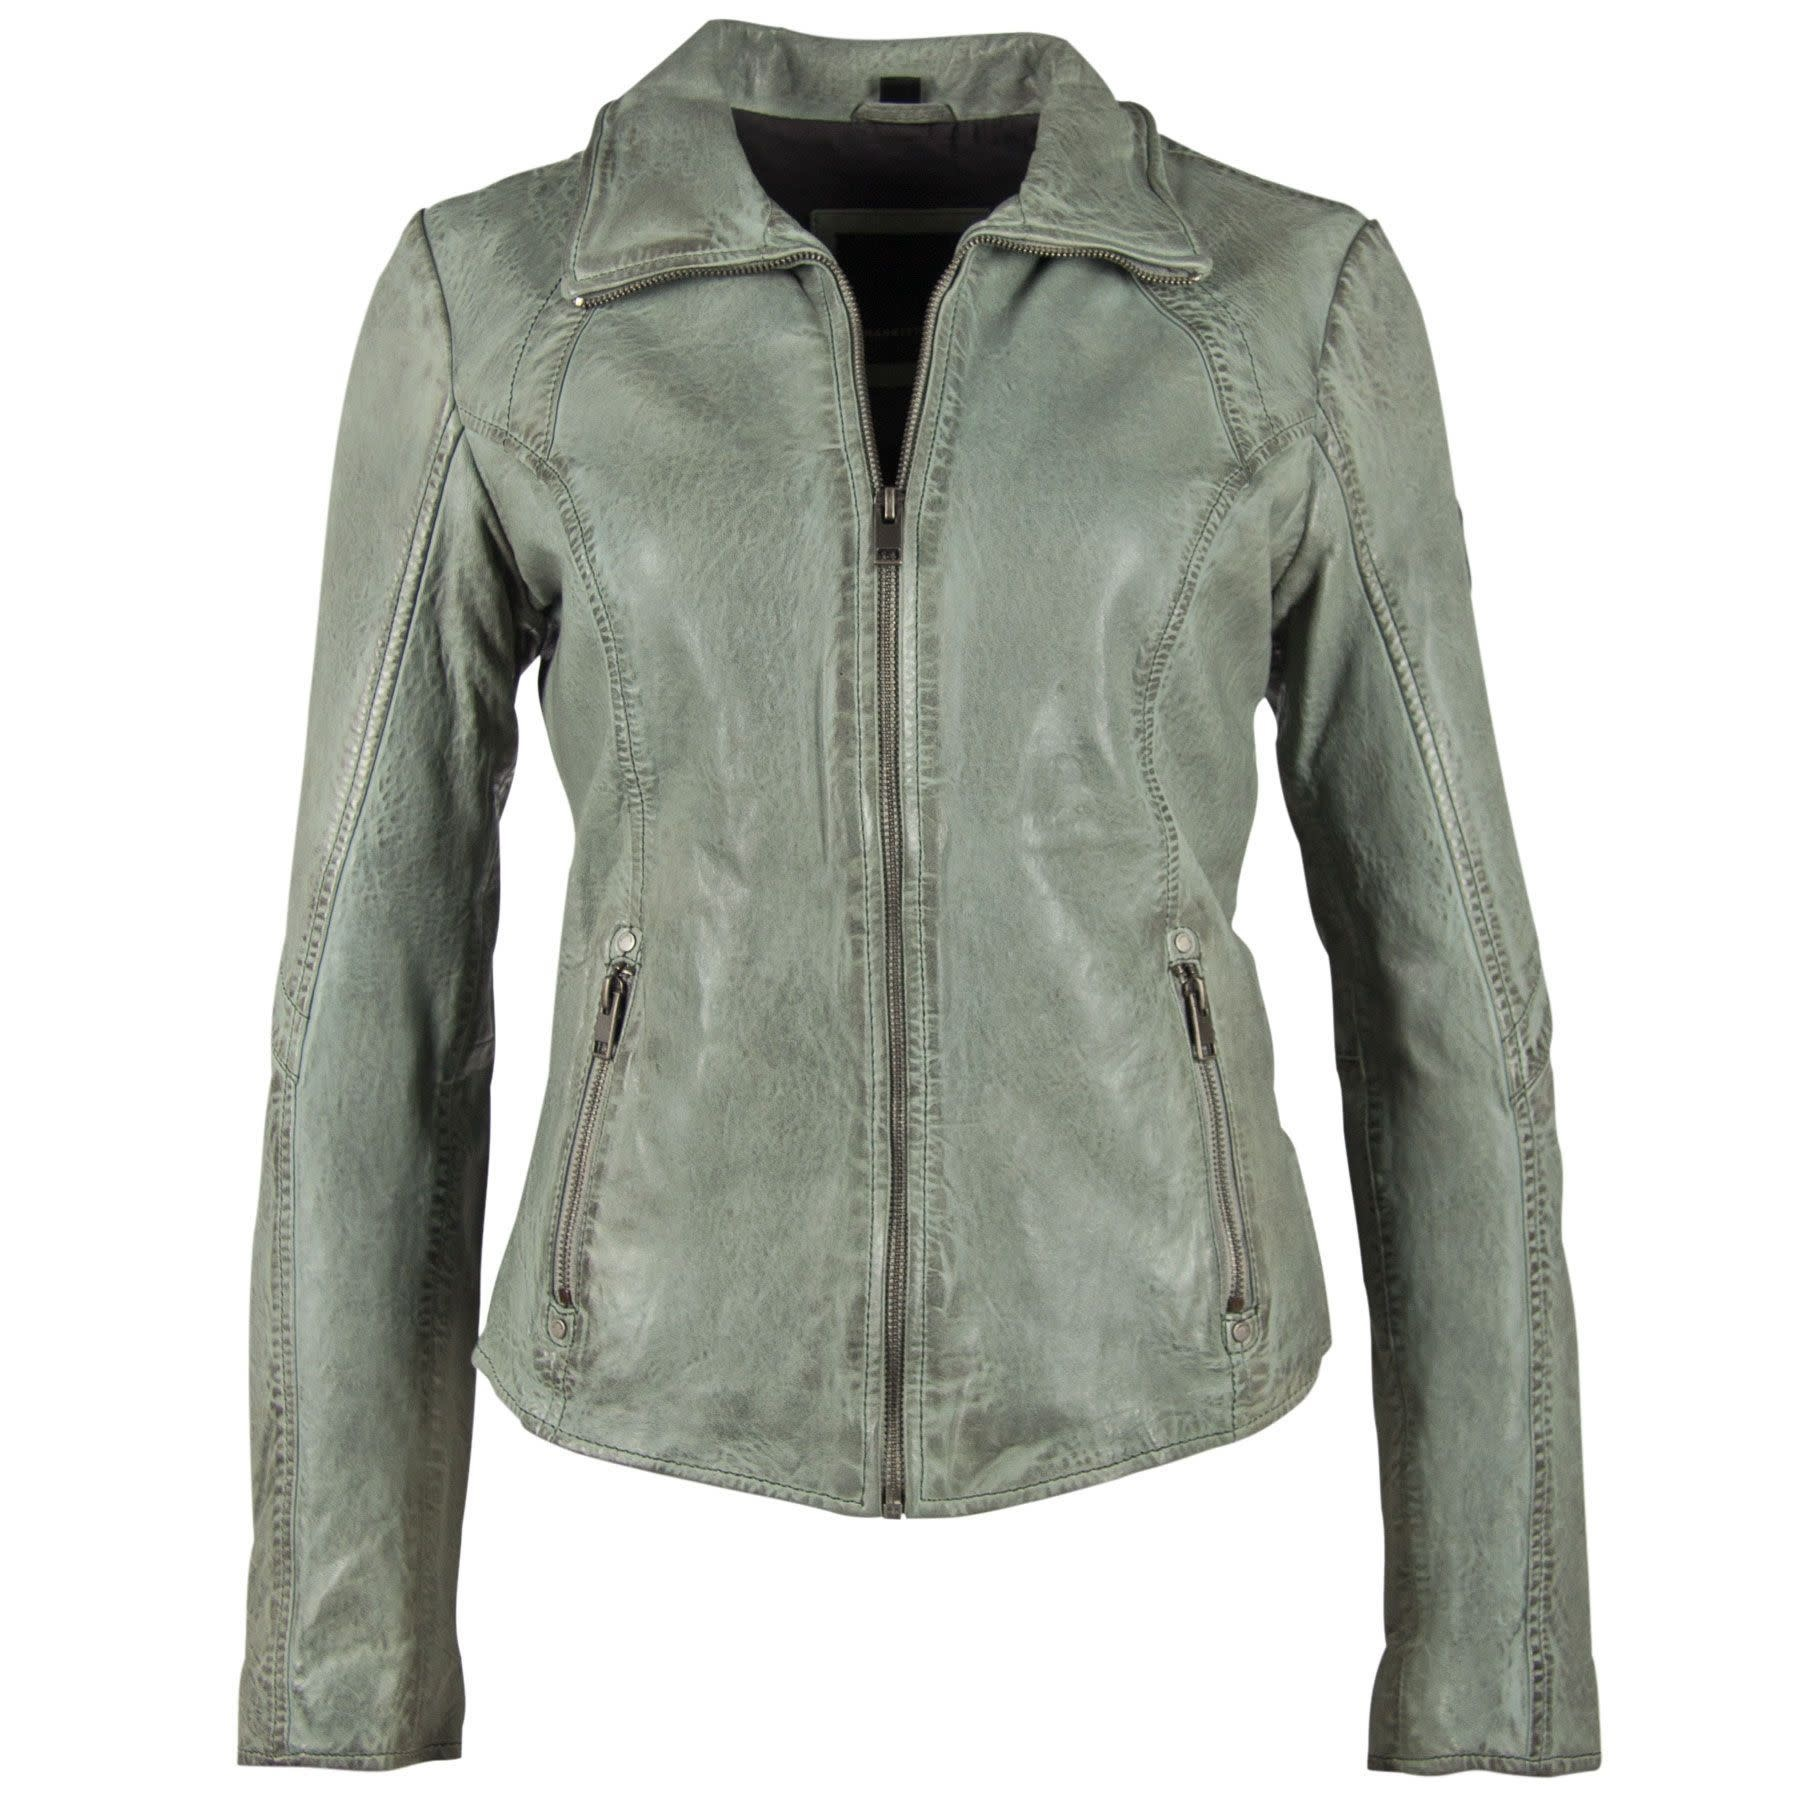 Else Leather Jacket